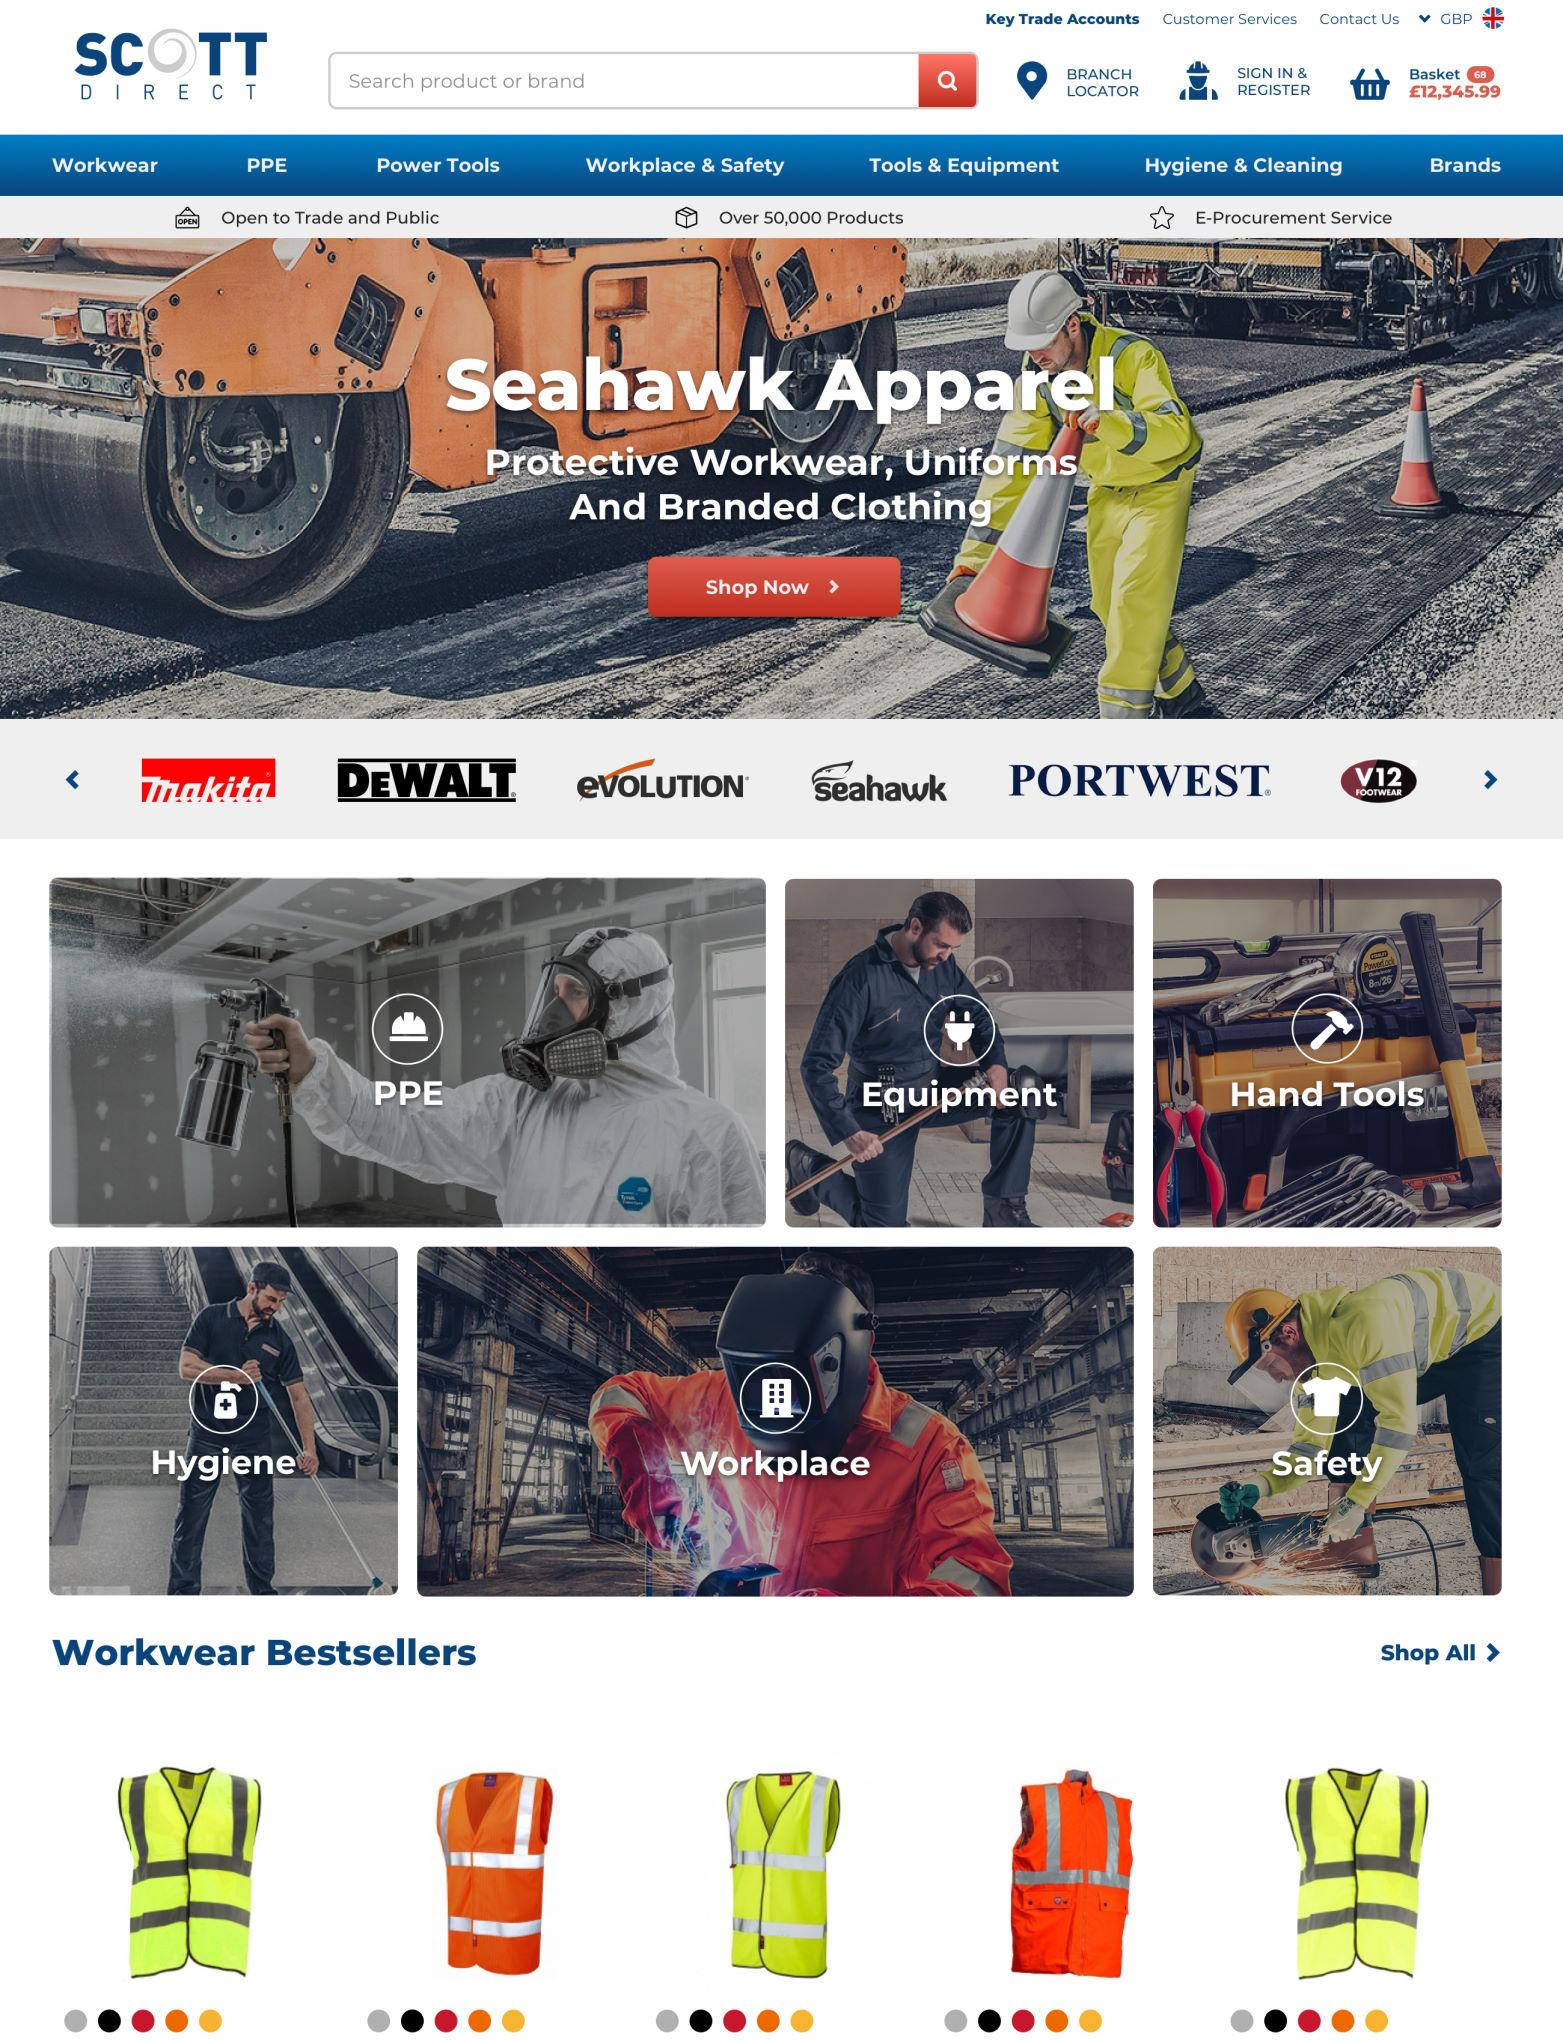 Scott Direct // Product Page // Magento 2 B2B/B2C Ecommerce Website